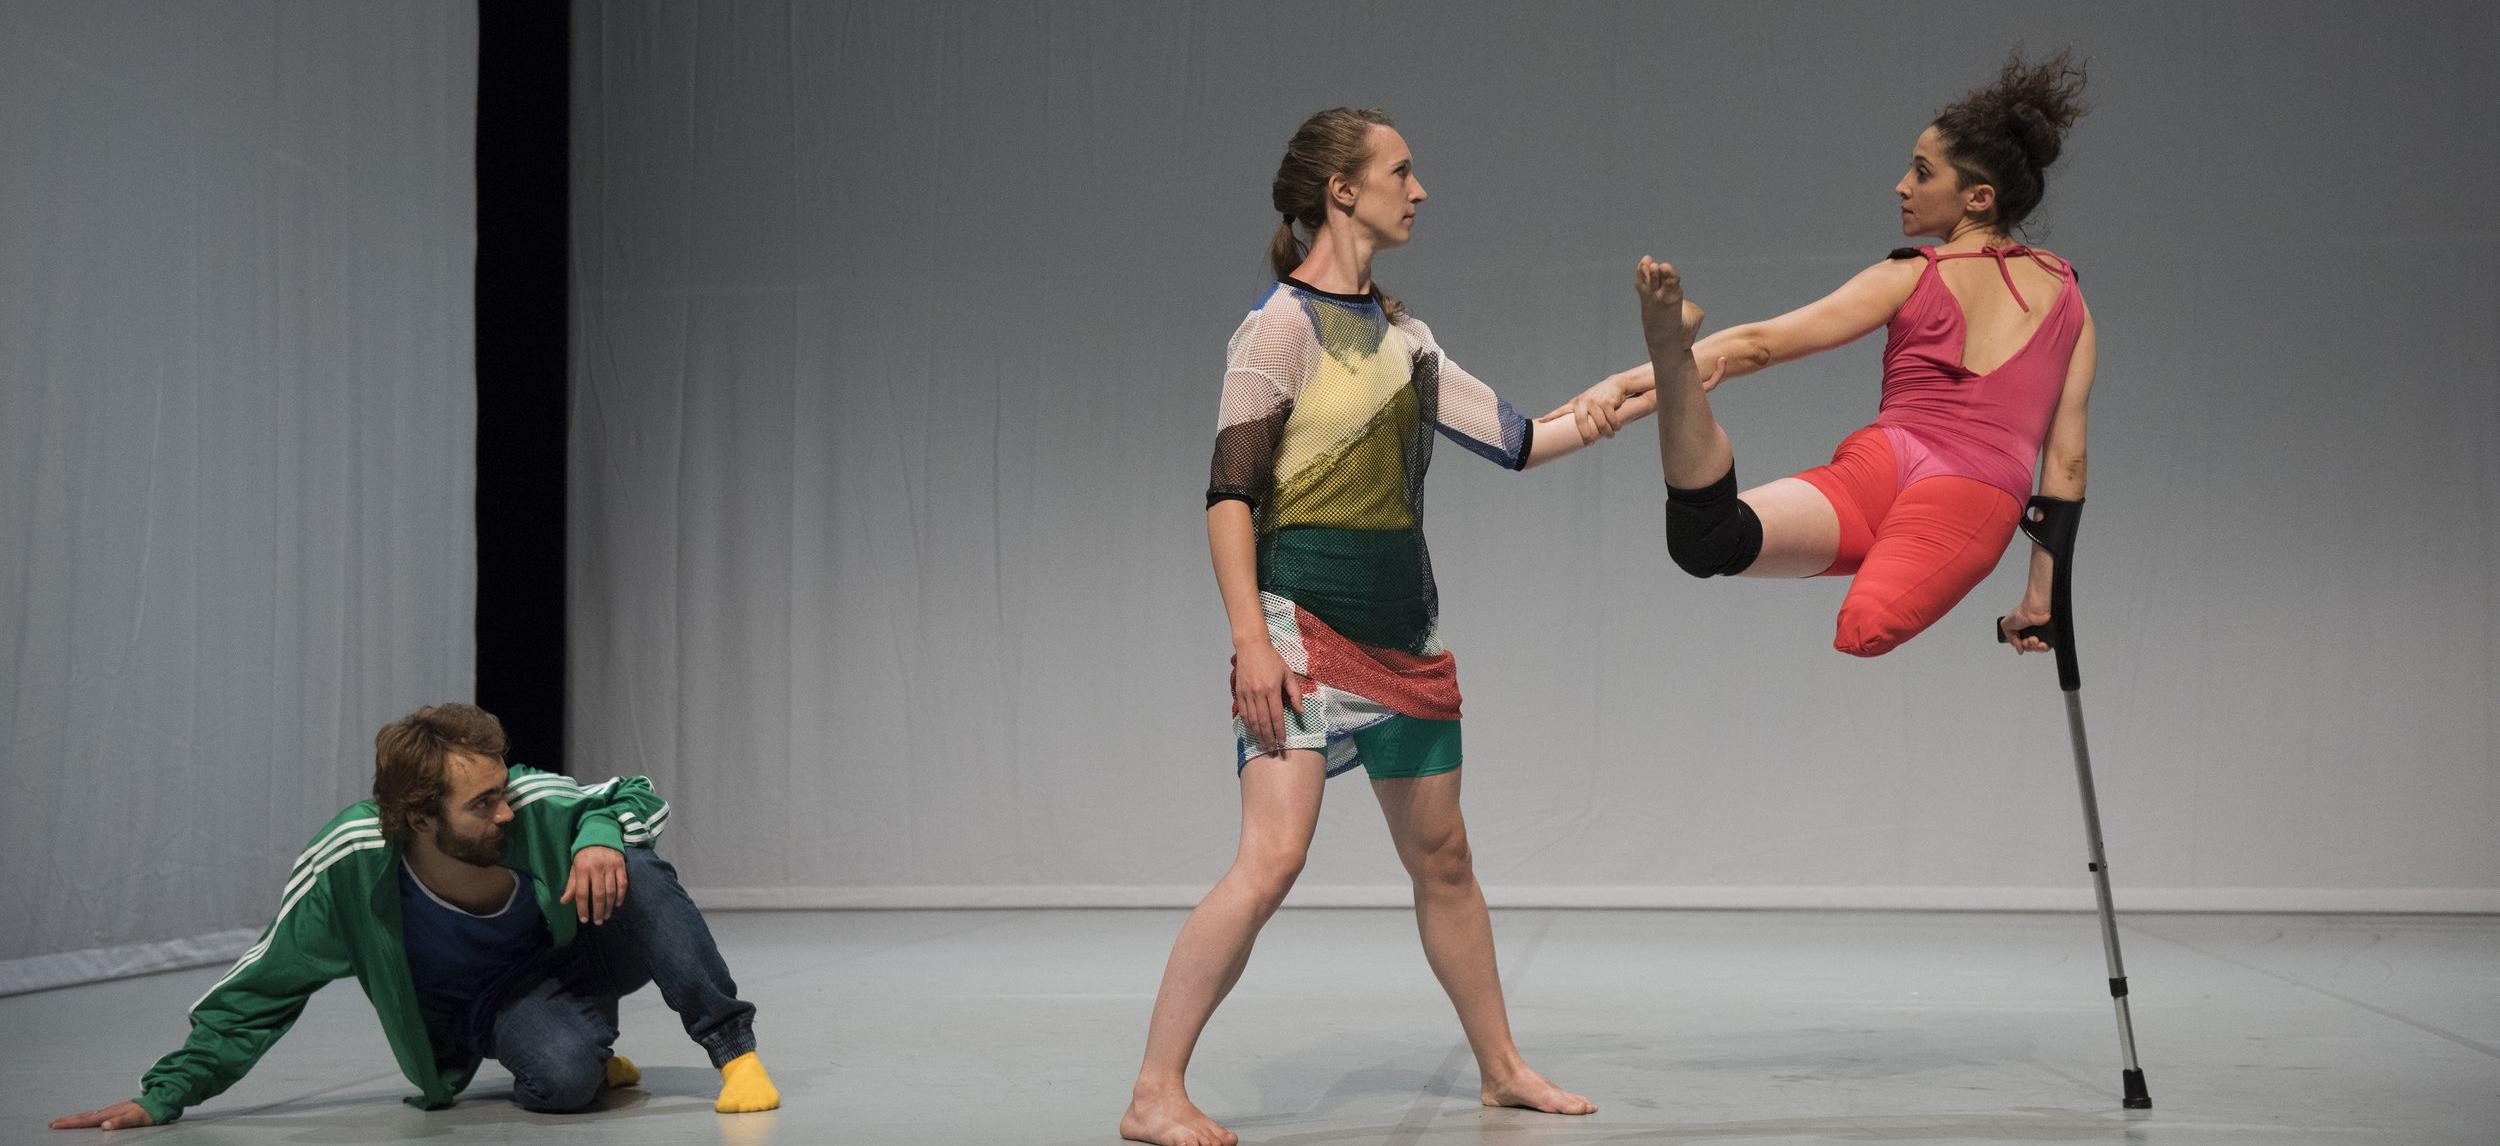 Candoco Dance Company. Face In by Yasmeen Godder. Photography by Hugo Glendinning, 2018.jpg